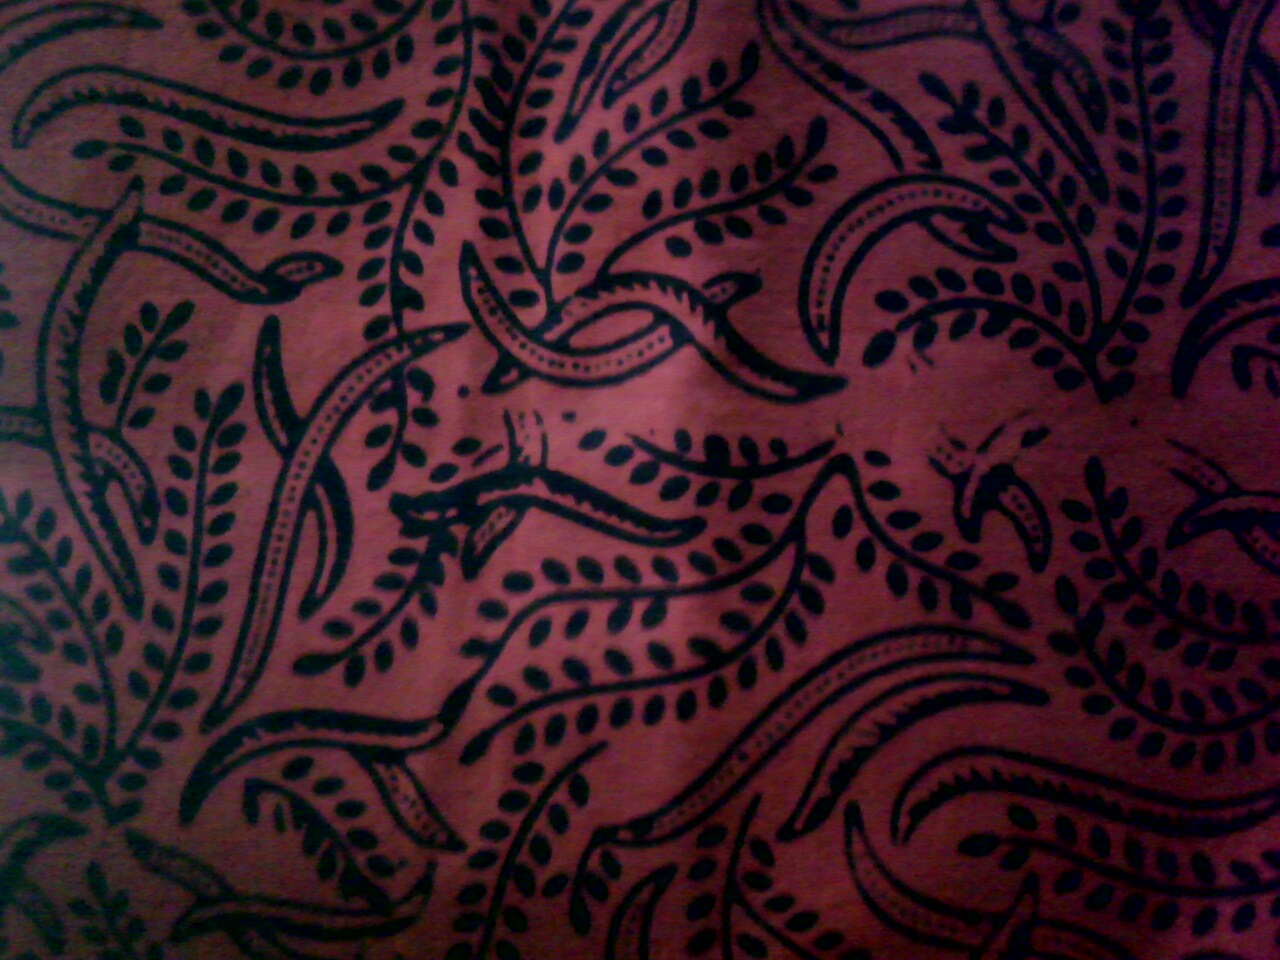 colour wallpaper traditional motif batik was an african batik dress